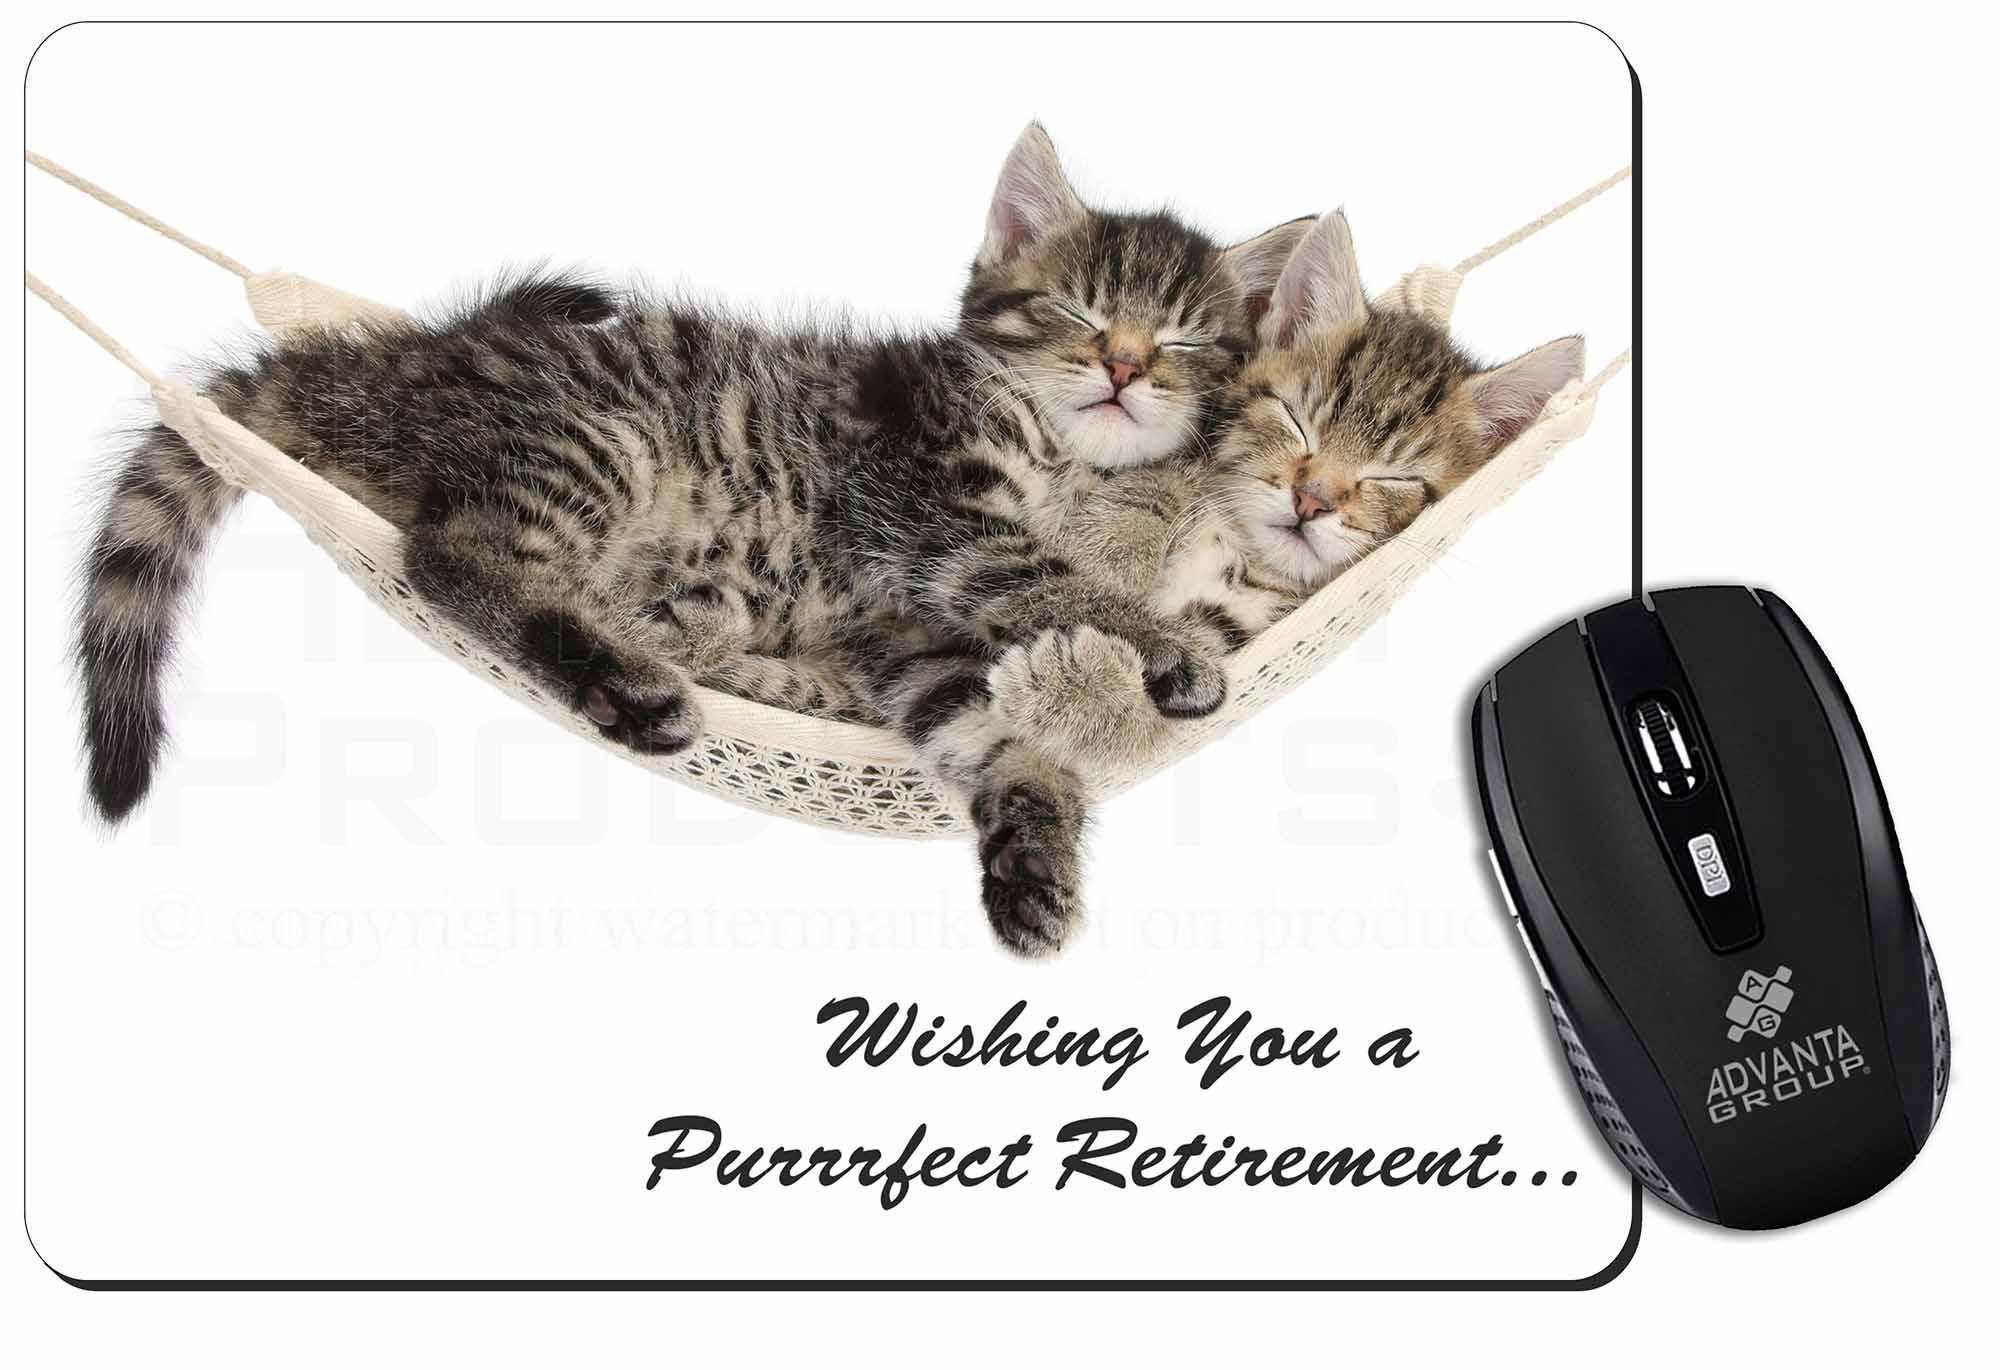 Kittens on Hammock /'Retirement/' Computer Mouse Mat Christmas Gift I AC-2RET206M